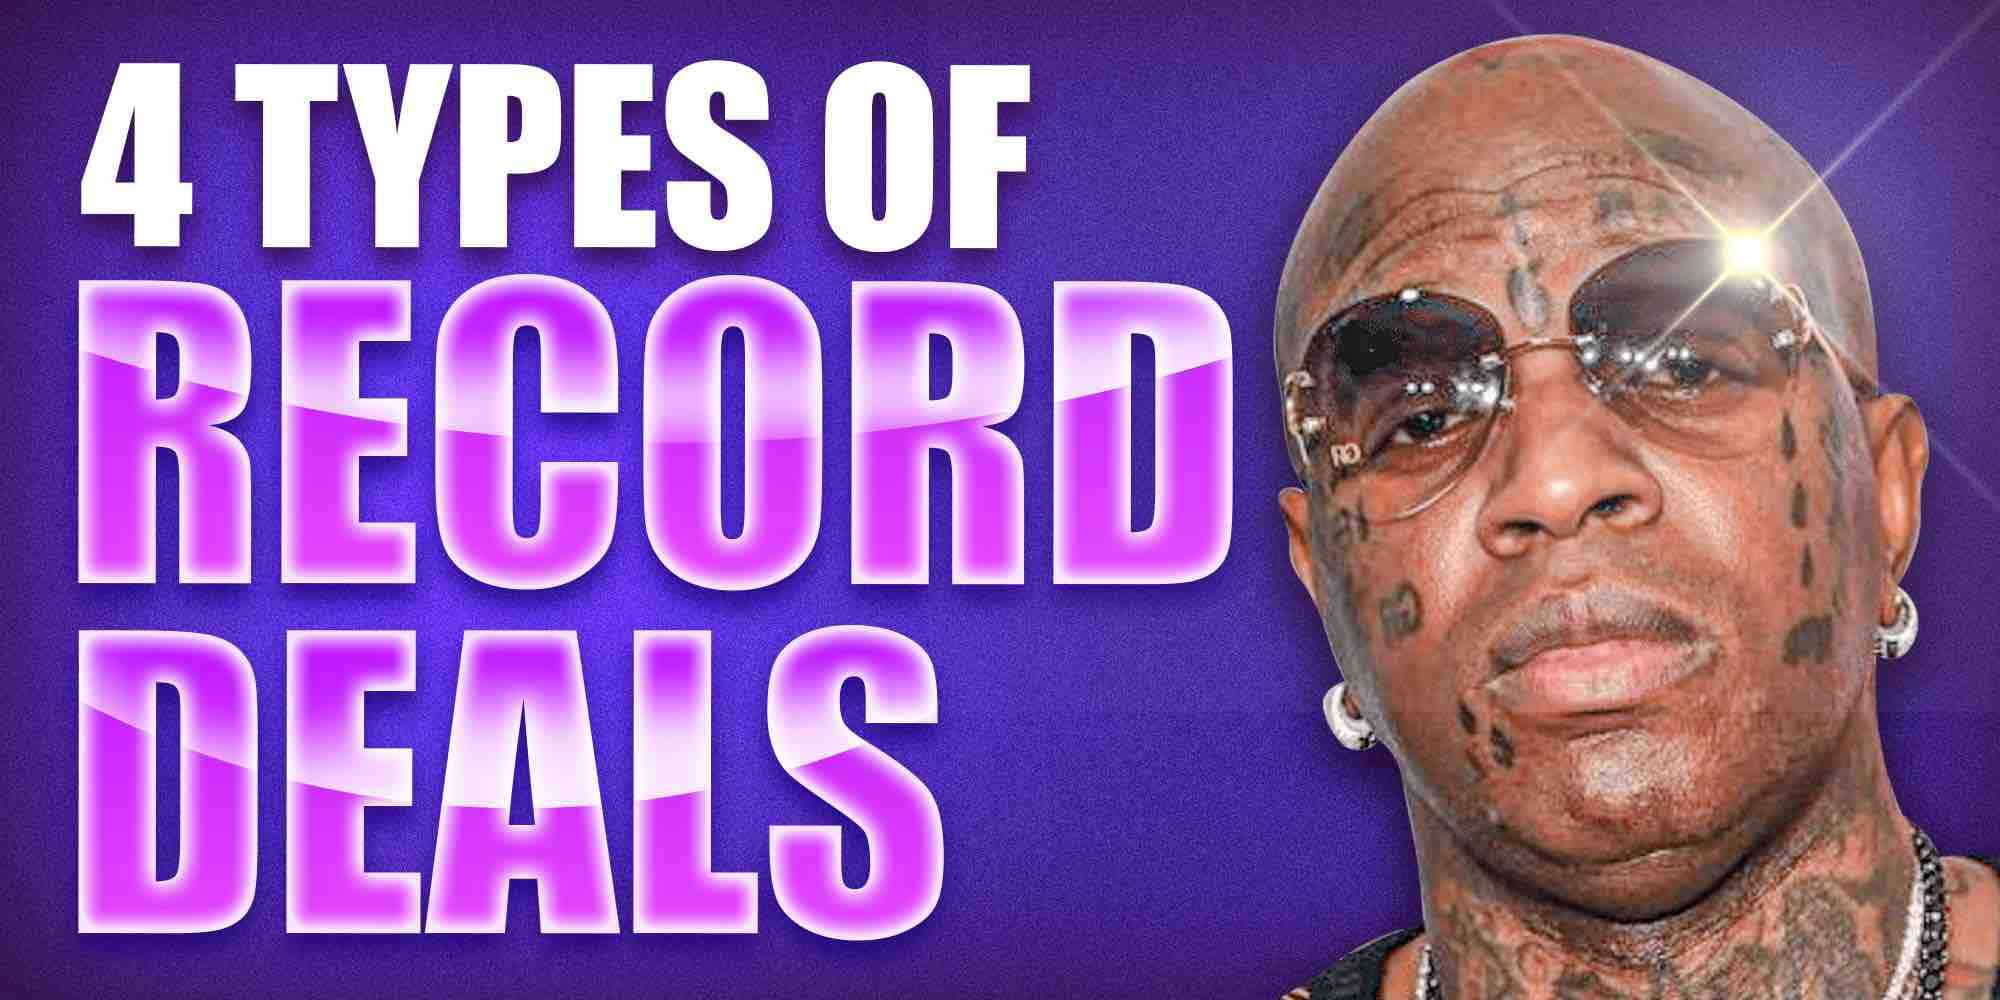 4 Types of recod deals